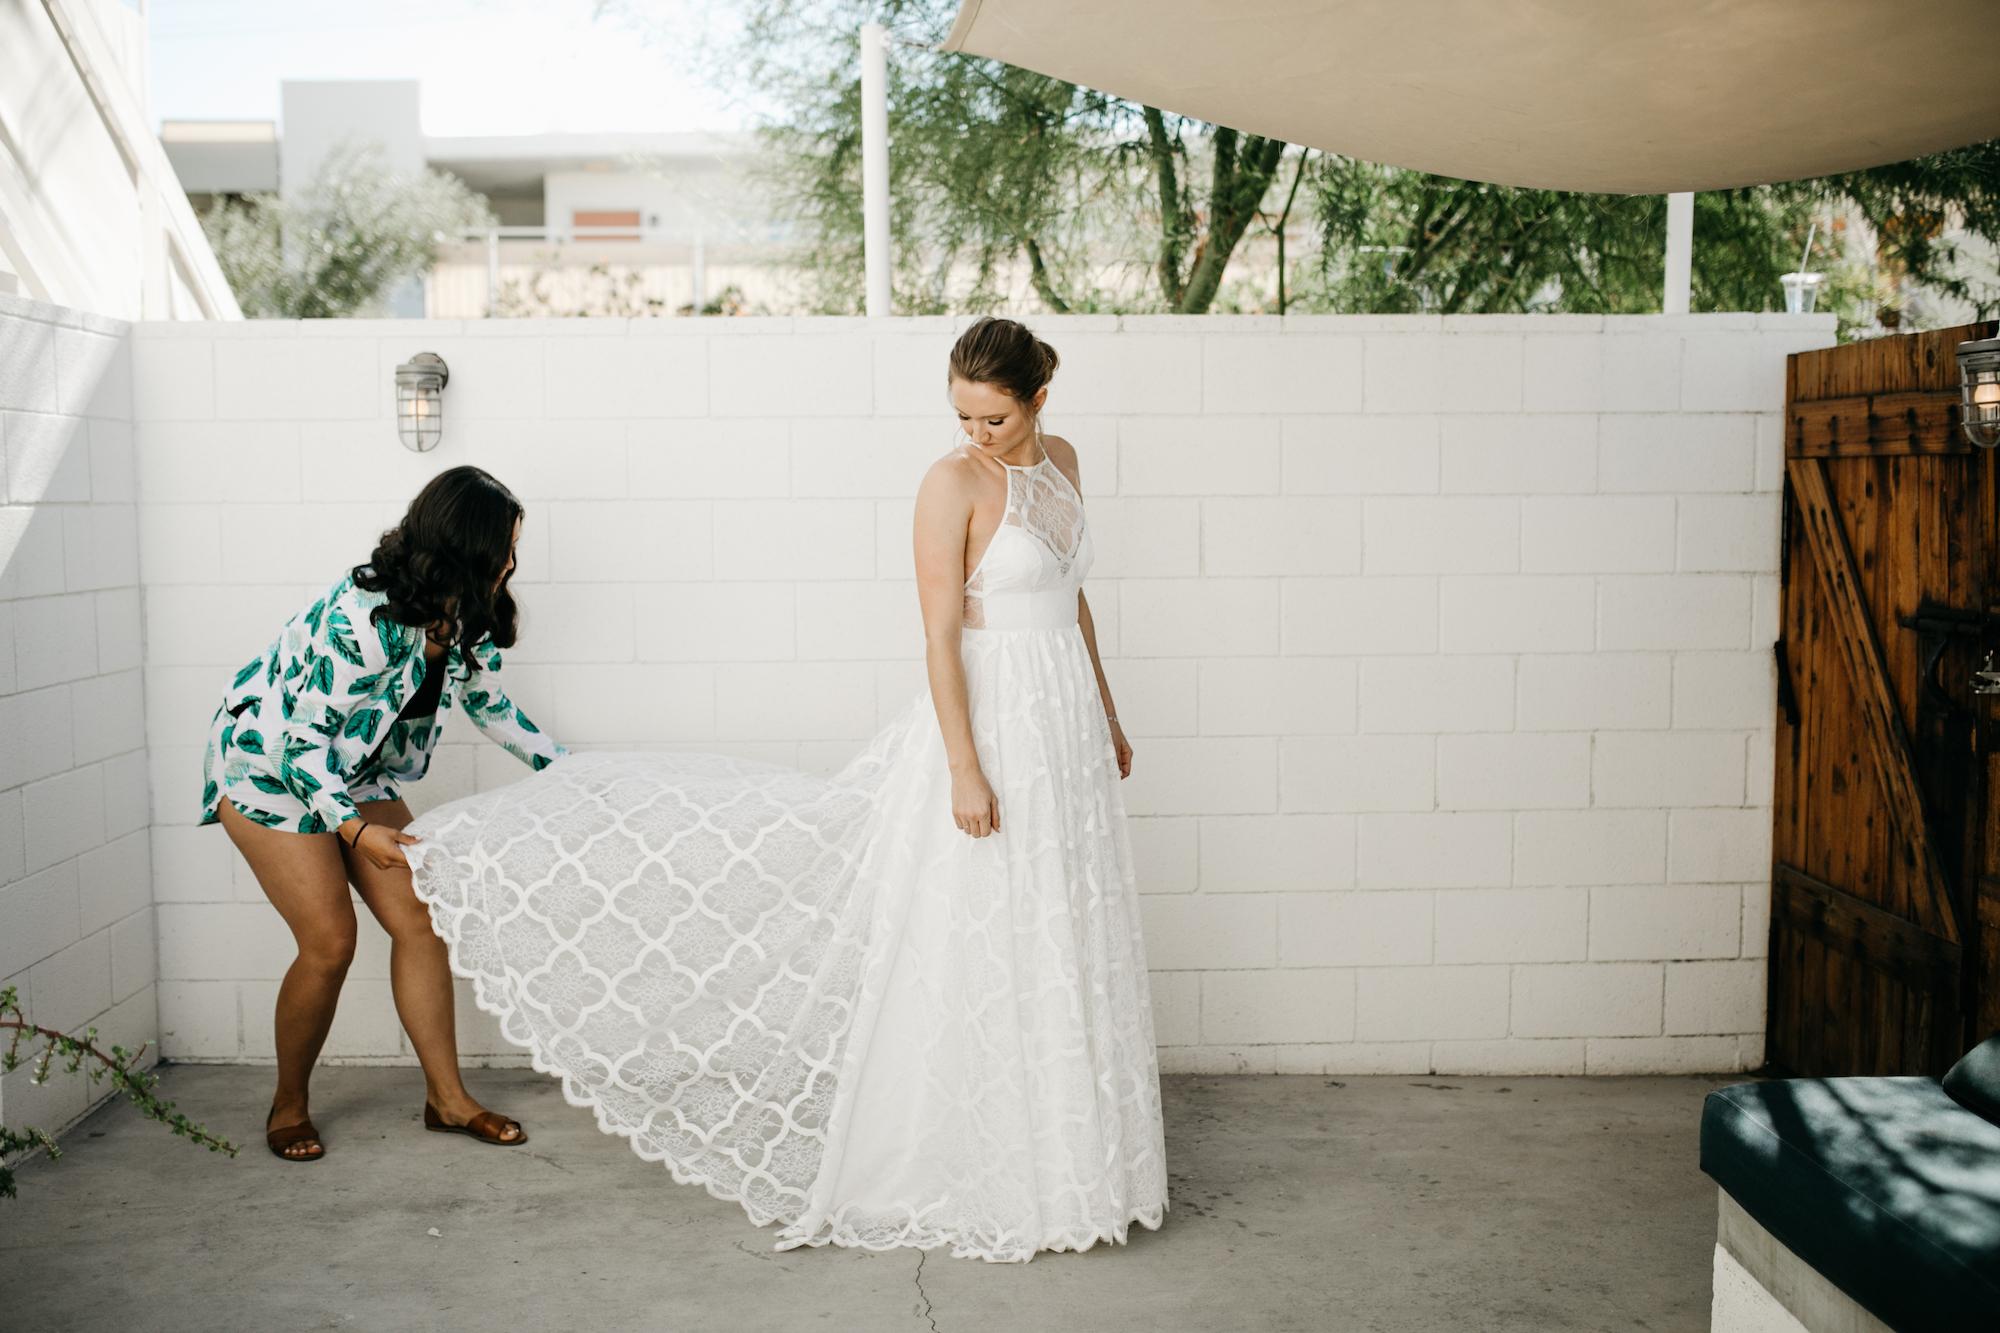 ace-hotel-palm-springs-wedding-photographer178.jpg